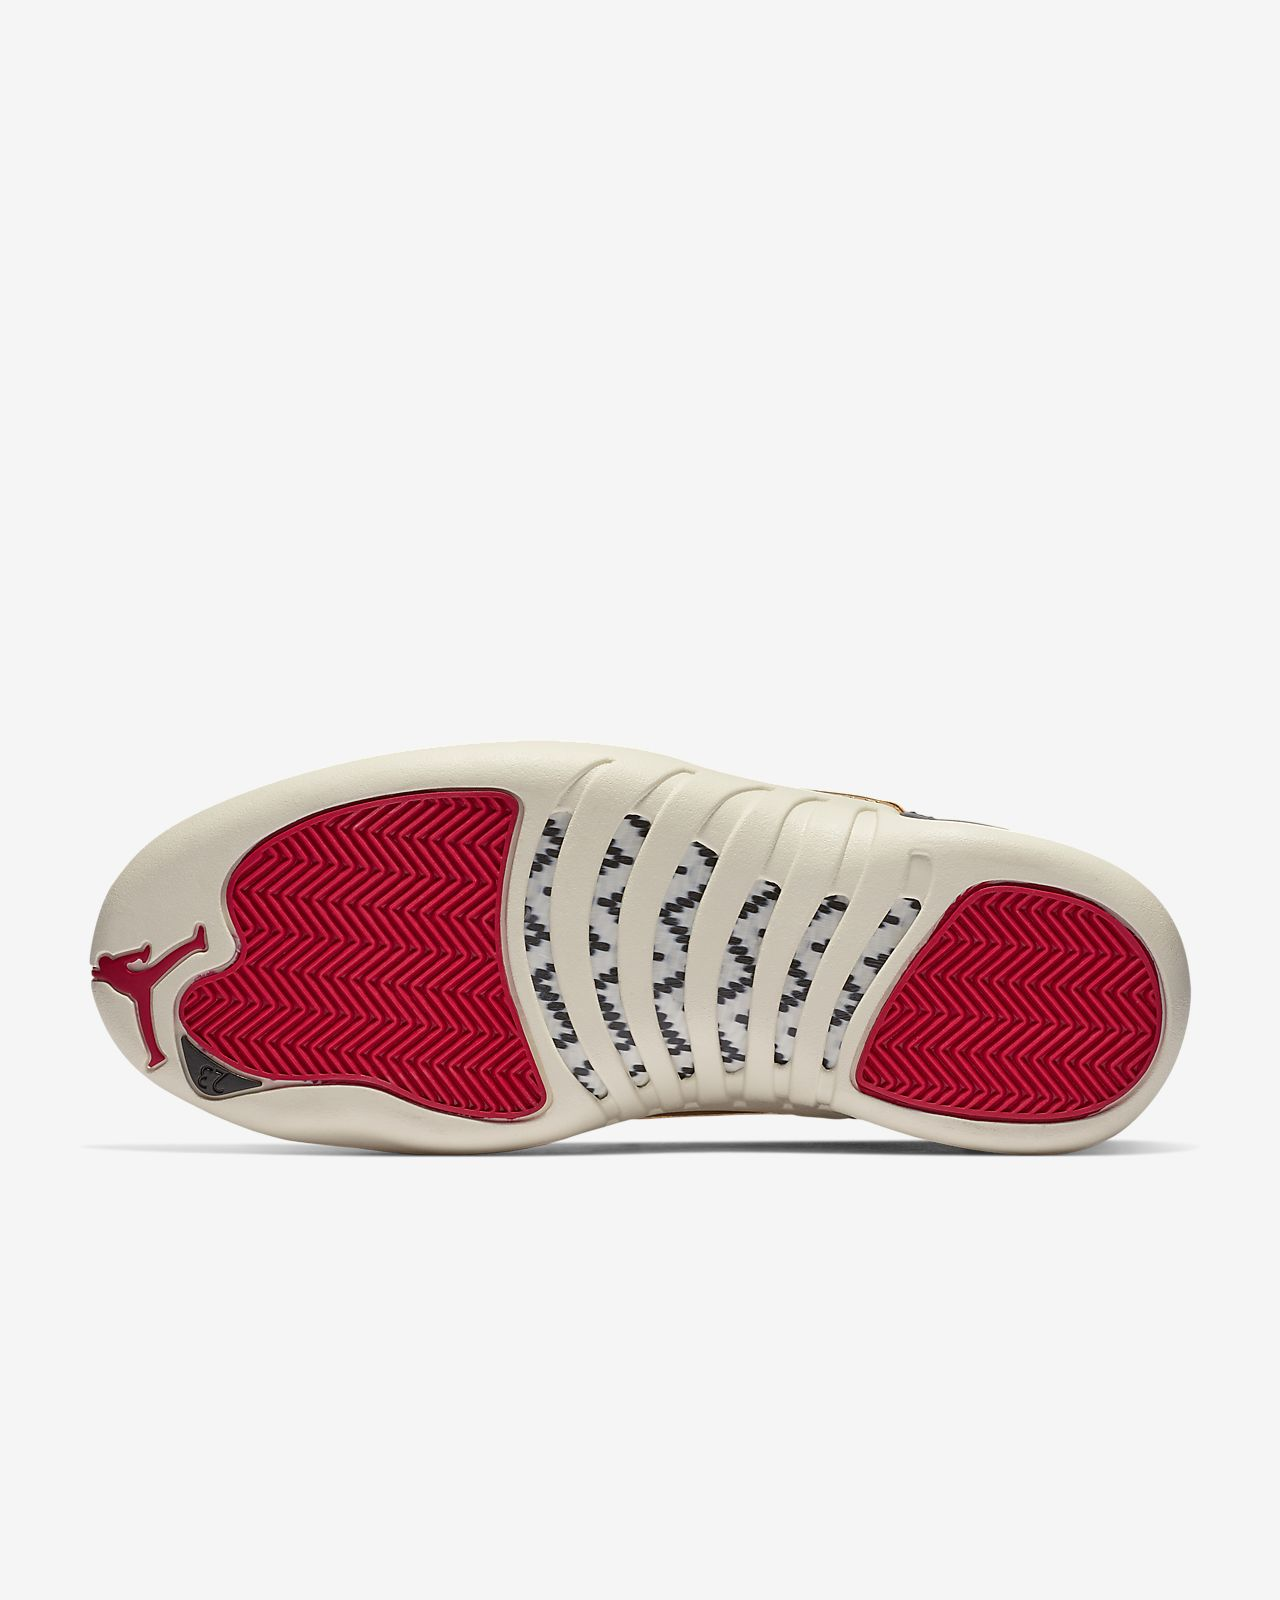 35da8bd6cfed Air Jordan 12 Retro CNY Men s Shoe. nikeid jordan 12